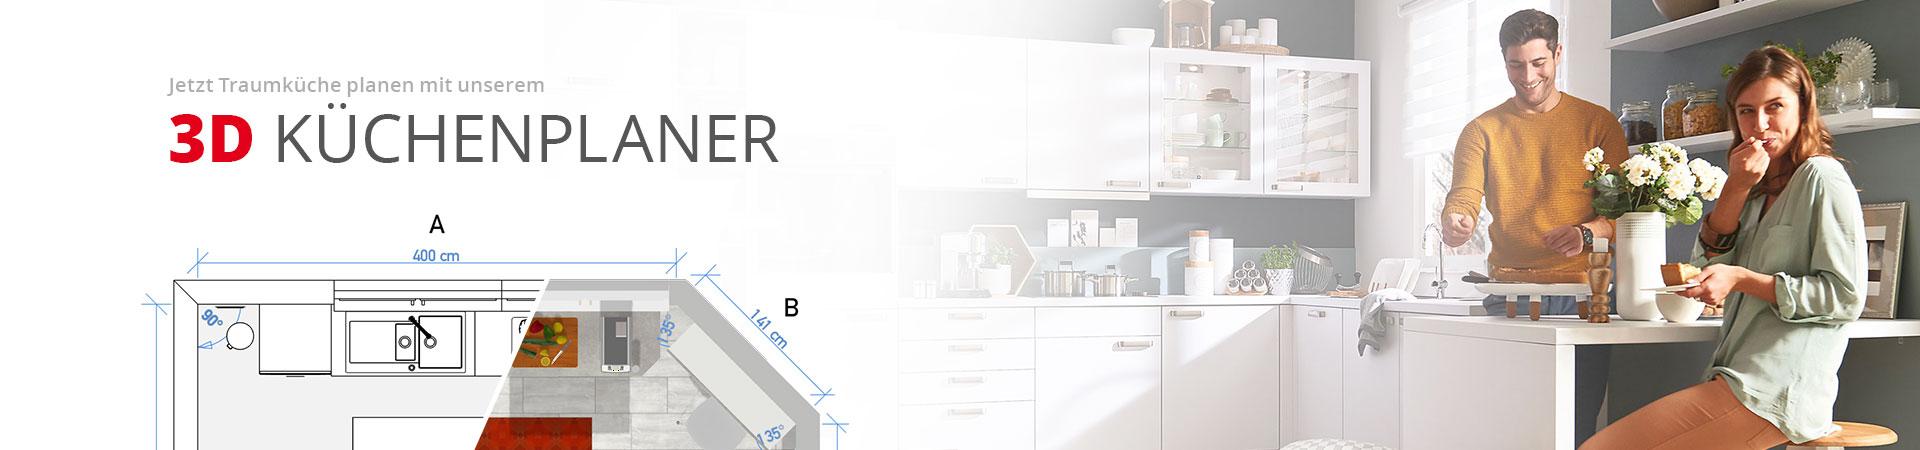 20D Küchenplanung mit Höffner  Möbel Höffner